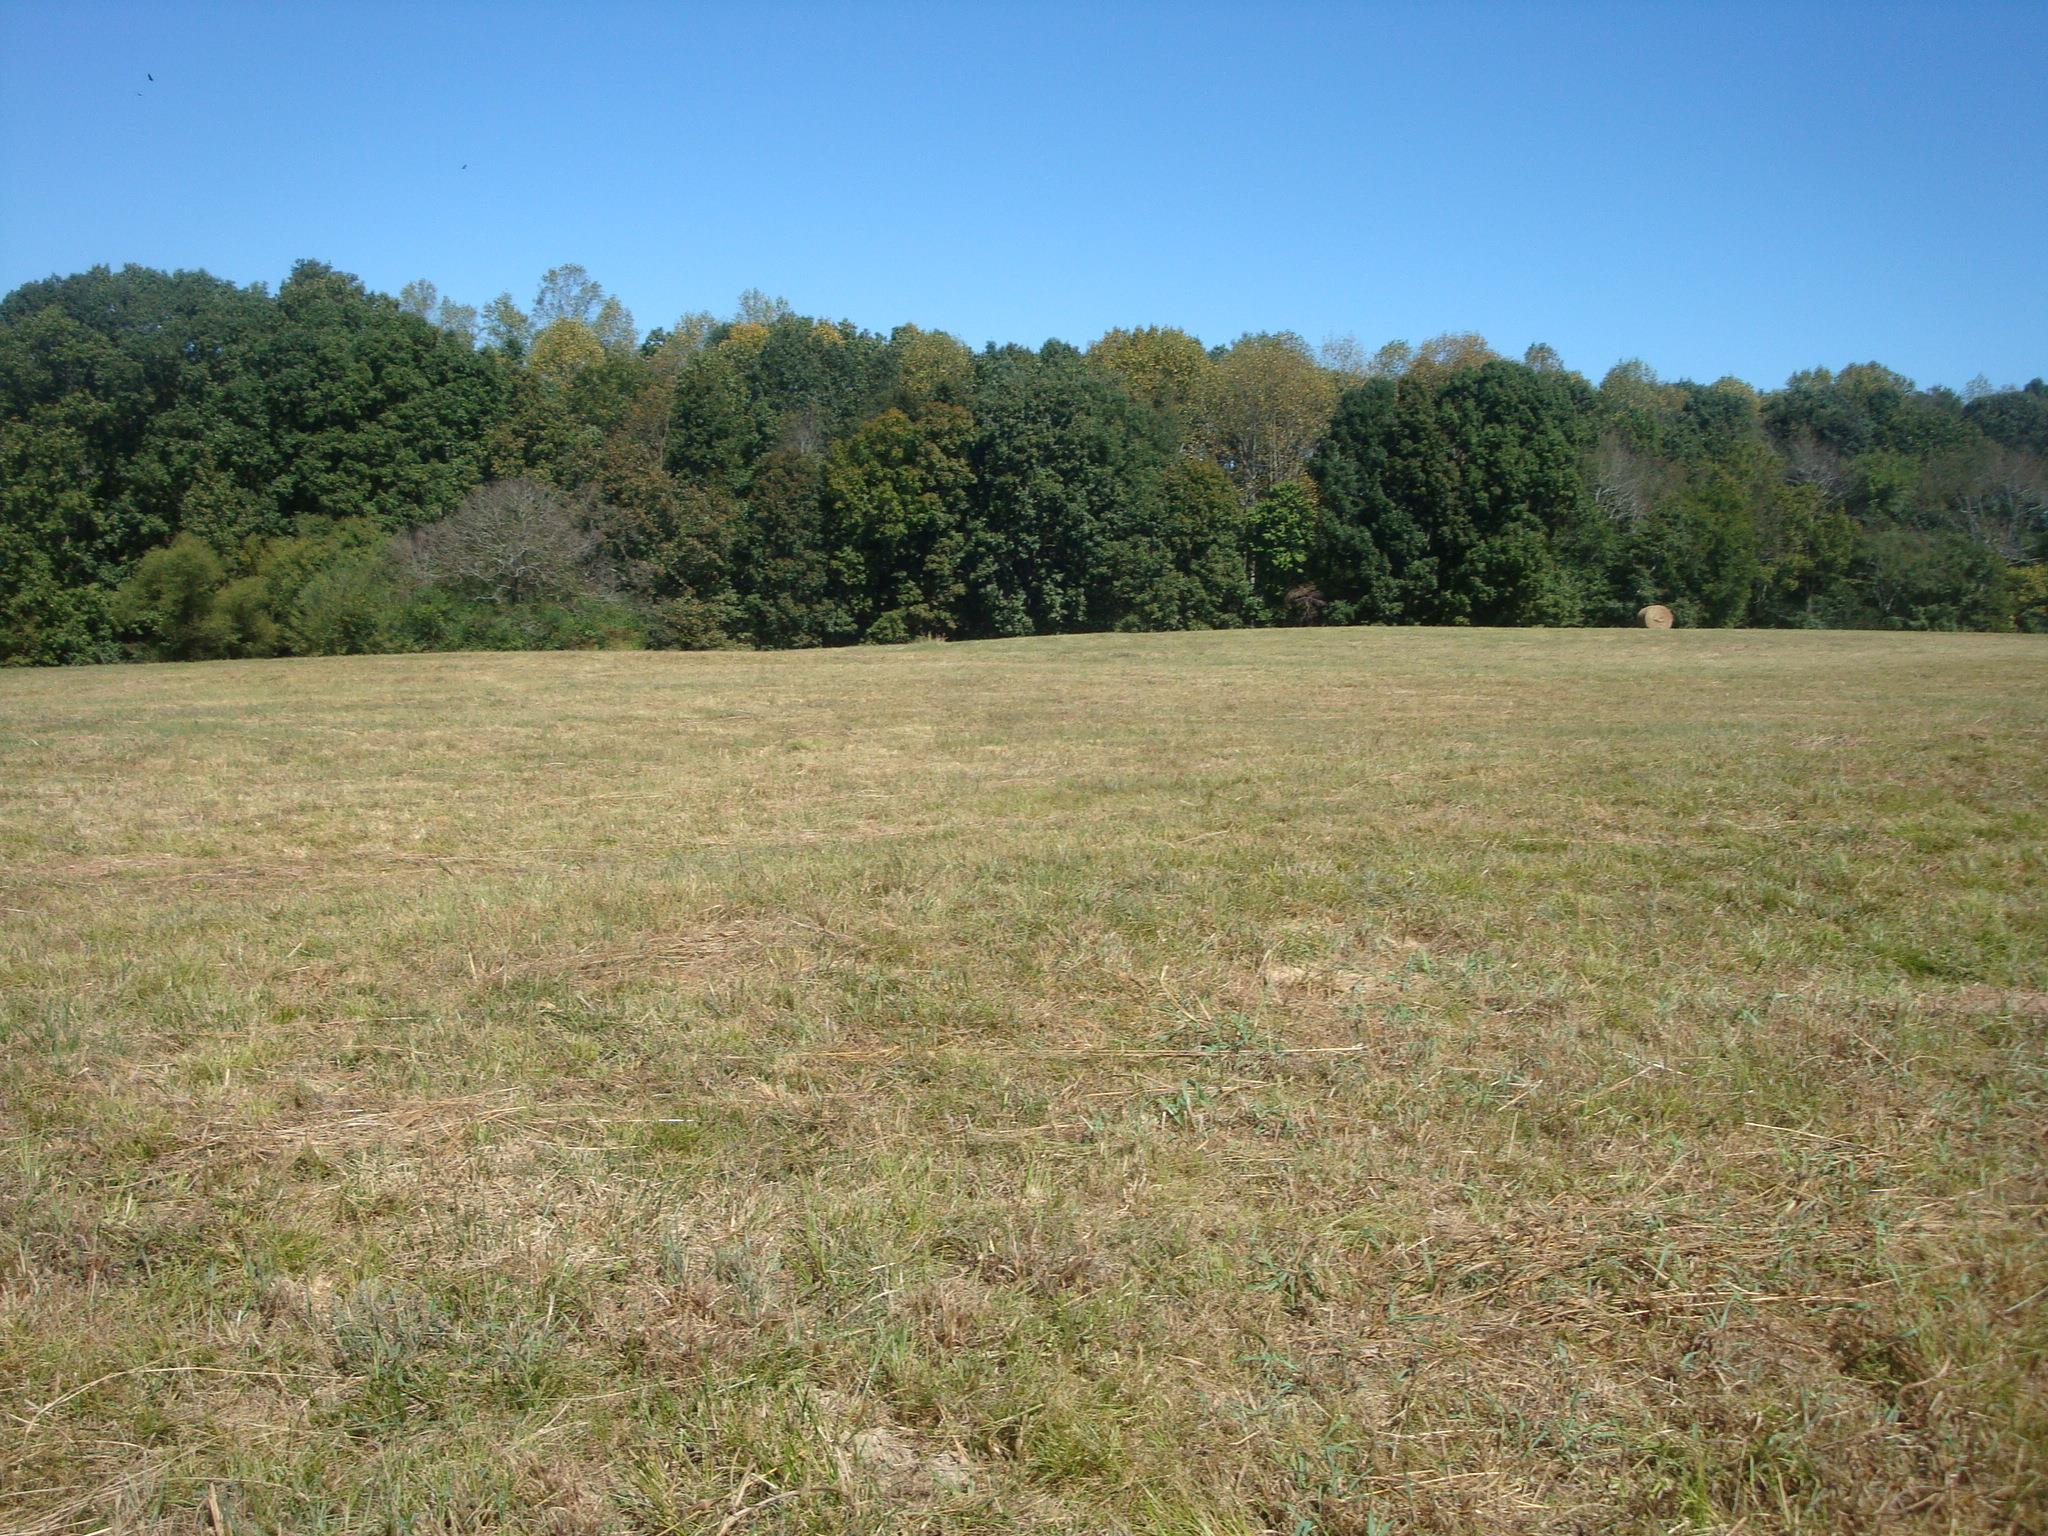 0 Rabbit Trail RD, Leoma, TN 38468 - Leoma, TN real estate listing